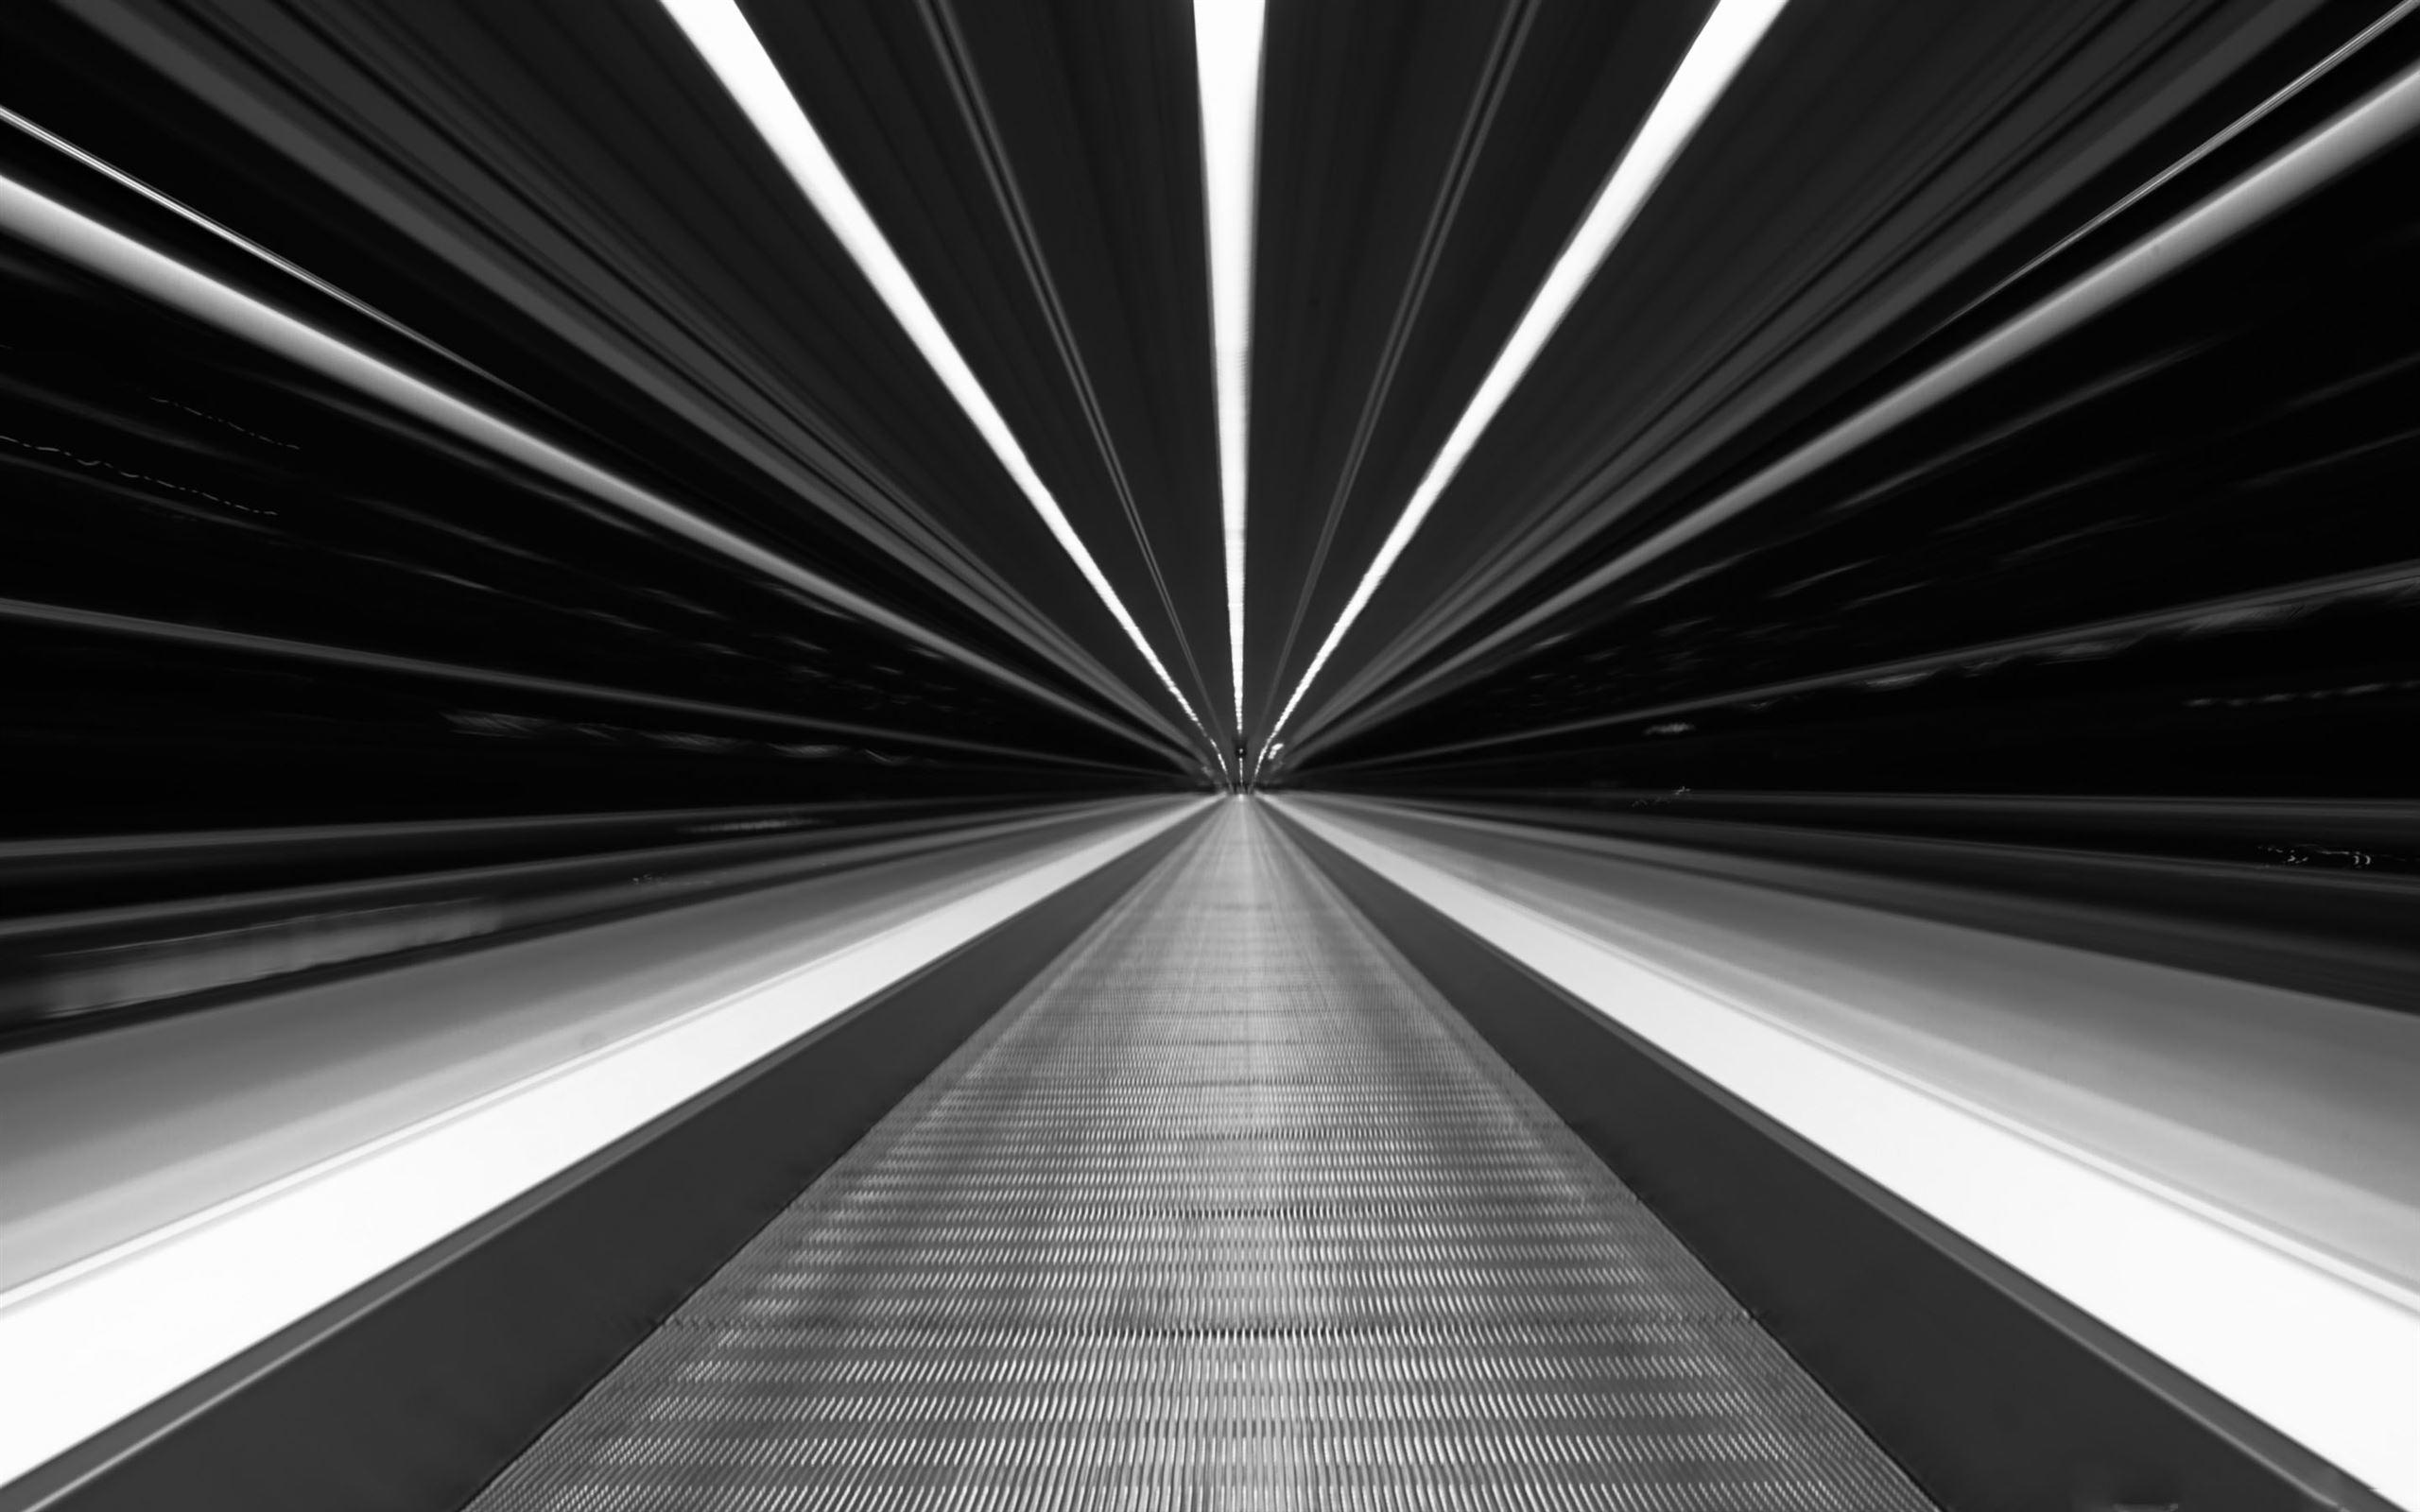 Abstract Conveyor Mac Wallpaper Download Allmacwallpaper